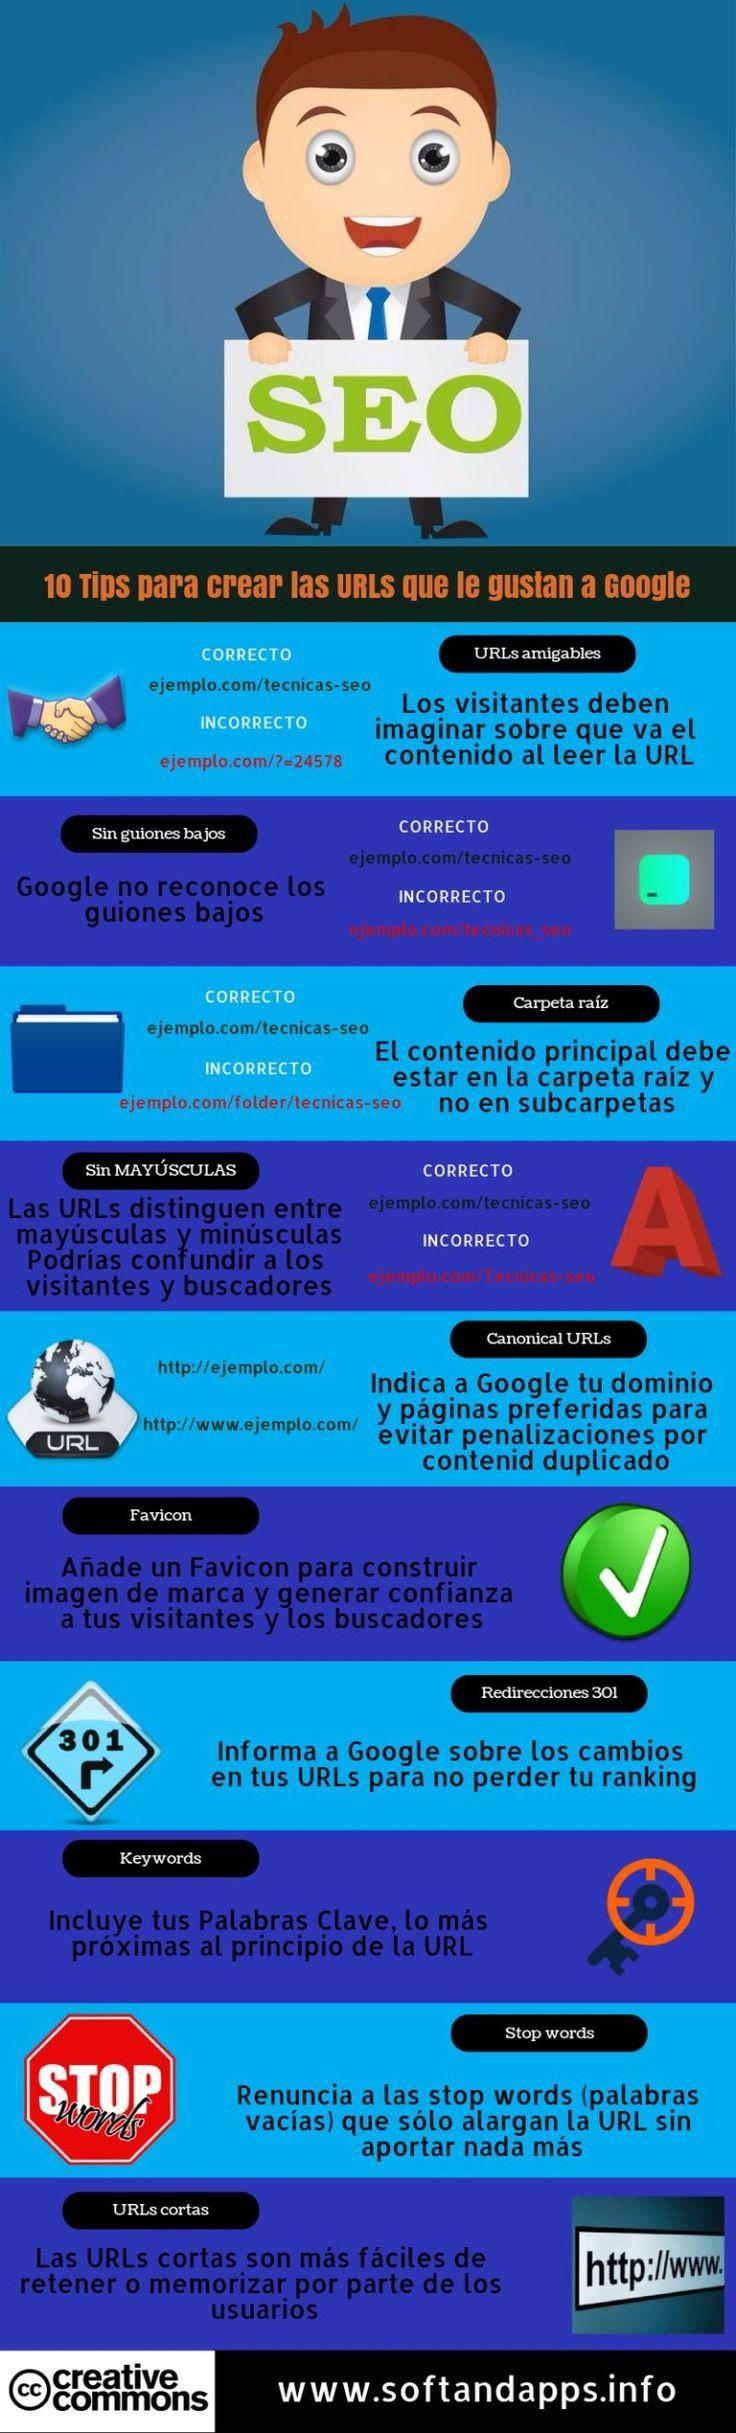 10 tips para crear las URLs que le gustan a Google. Infografía en español. #CommunityManager